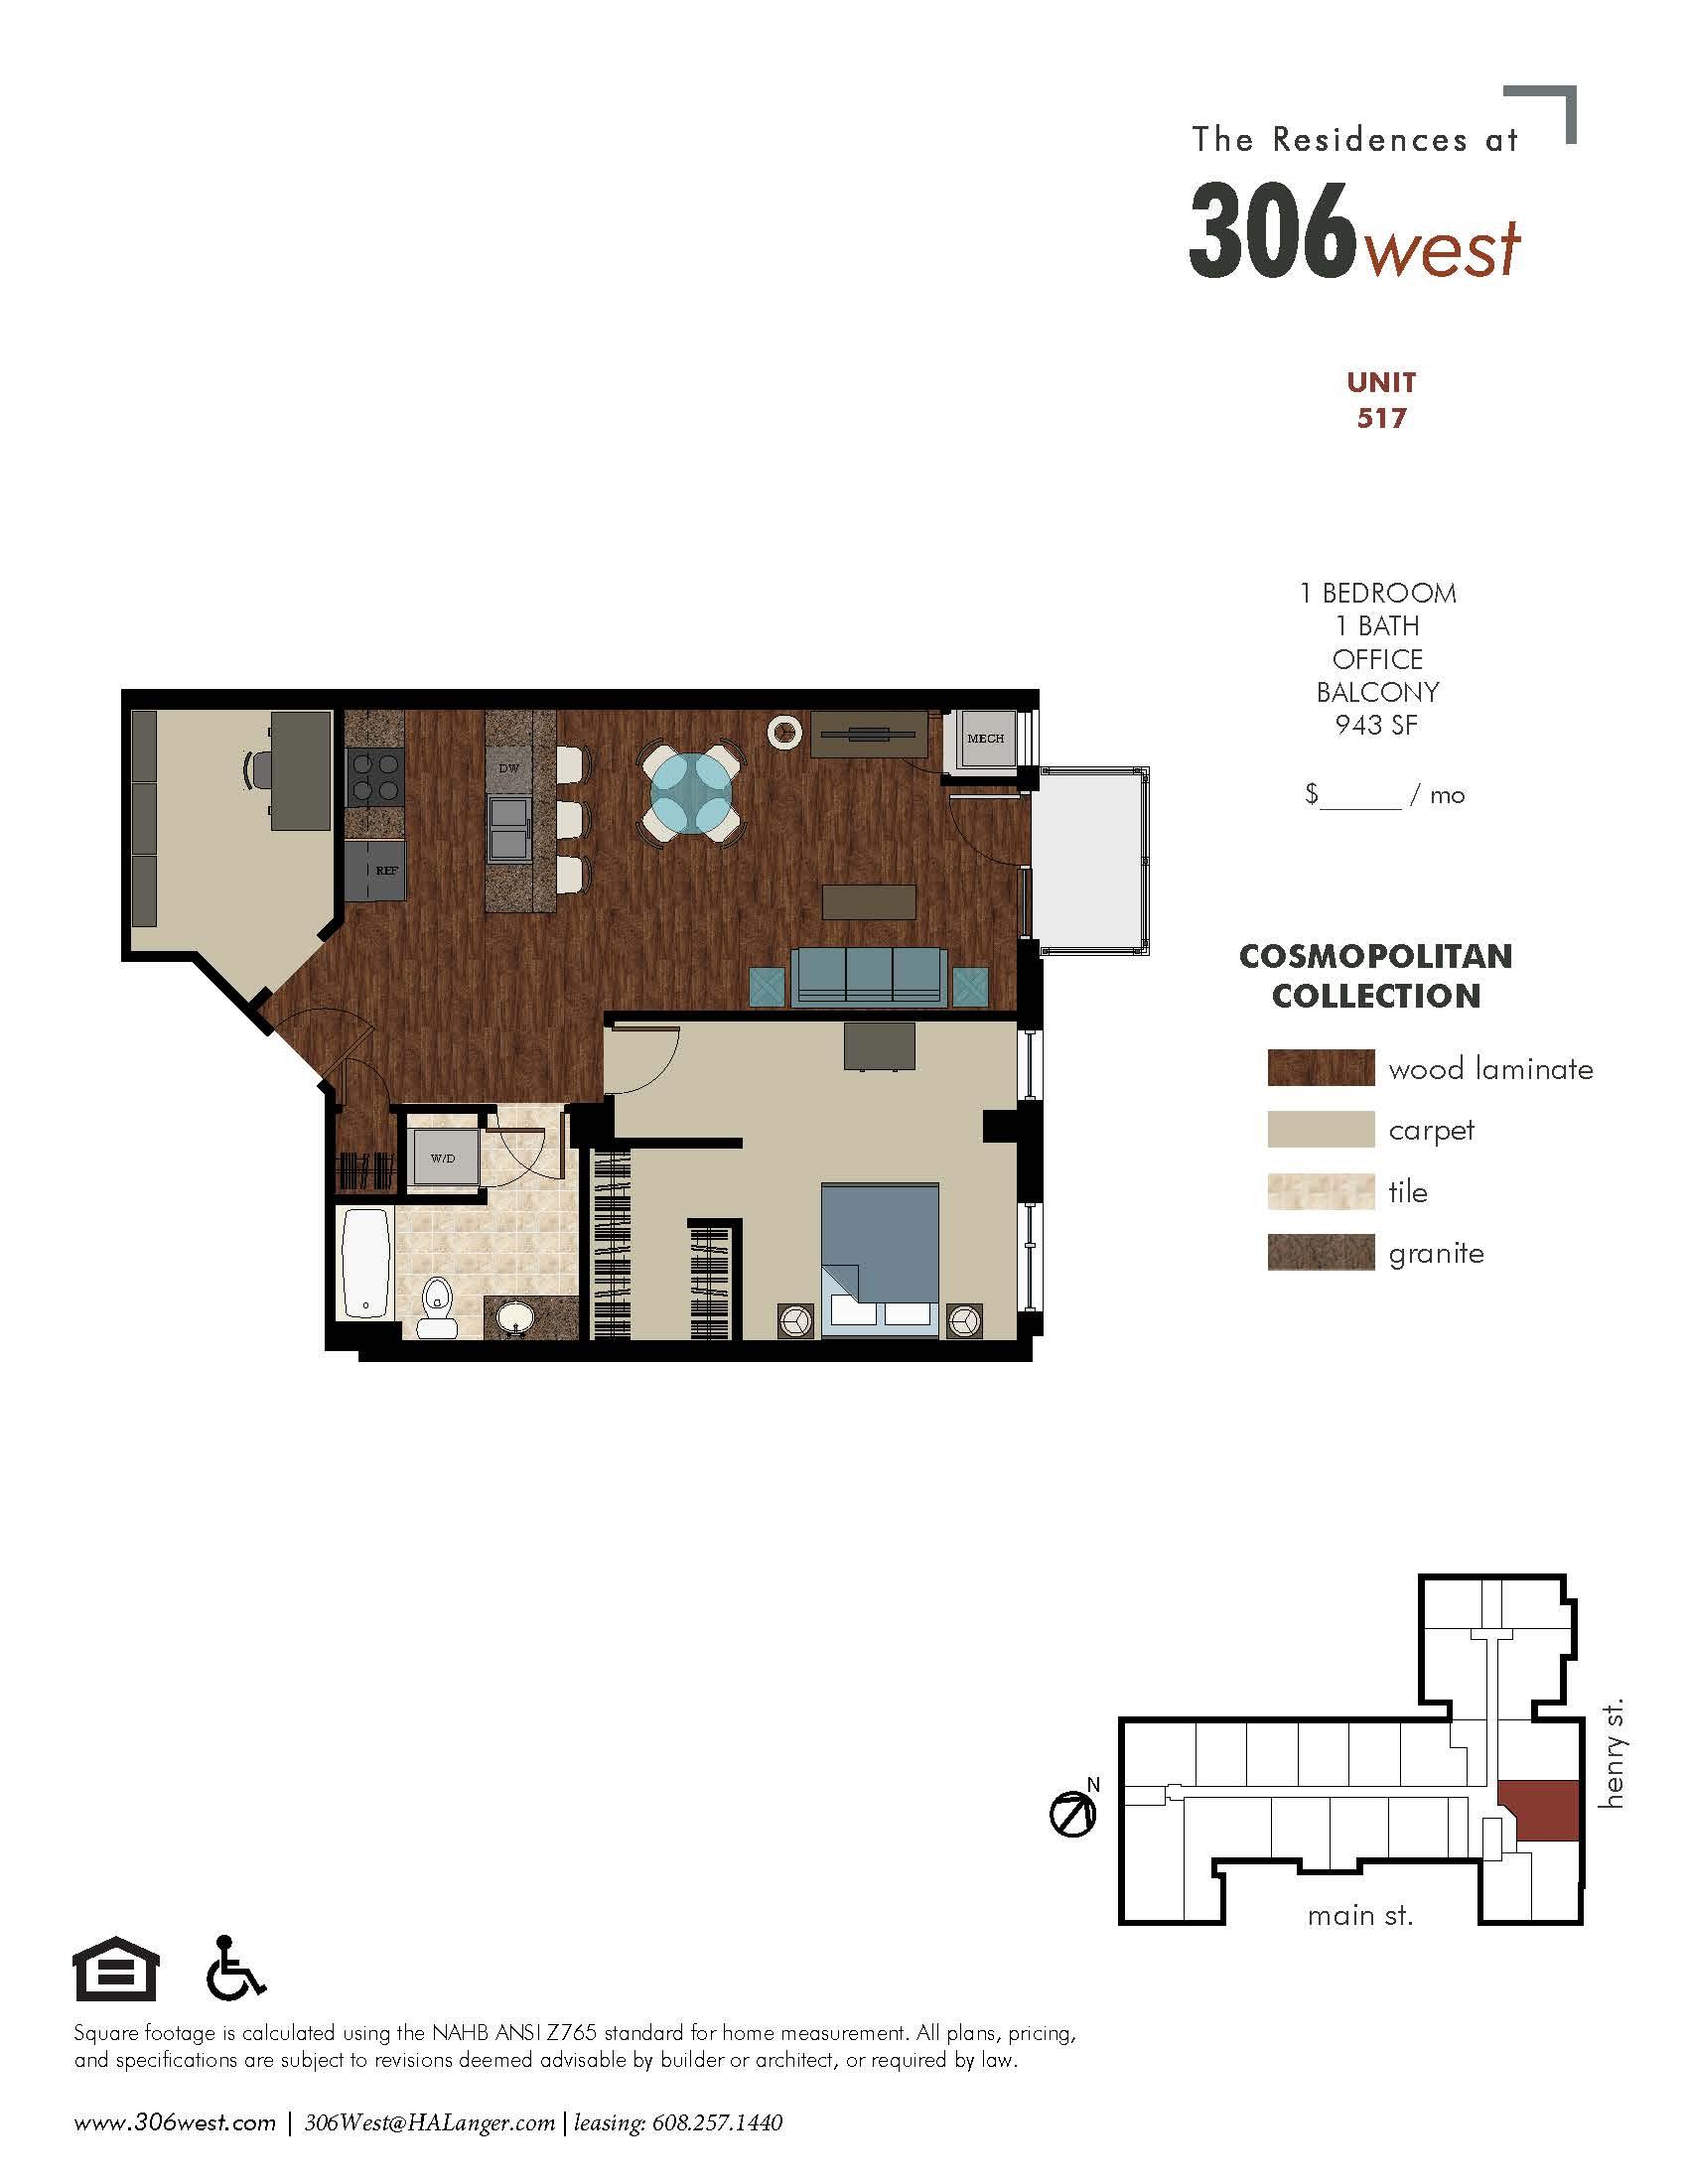 10 madison square west floor plans 100 10 madison square for 10 madison square west floor plans